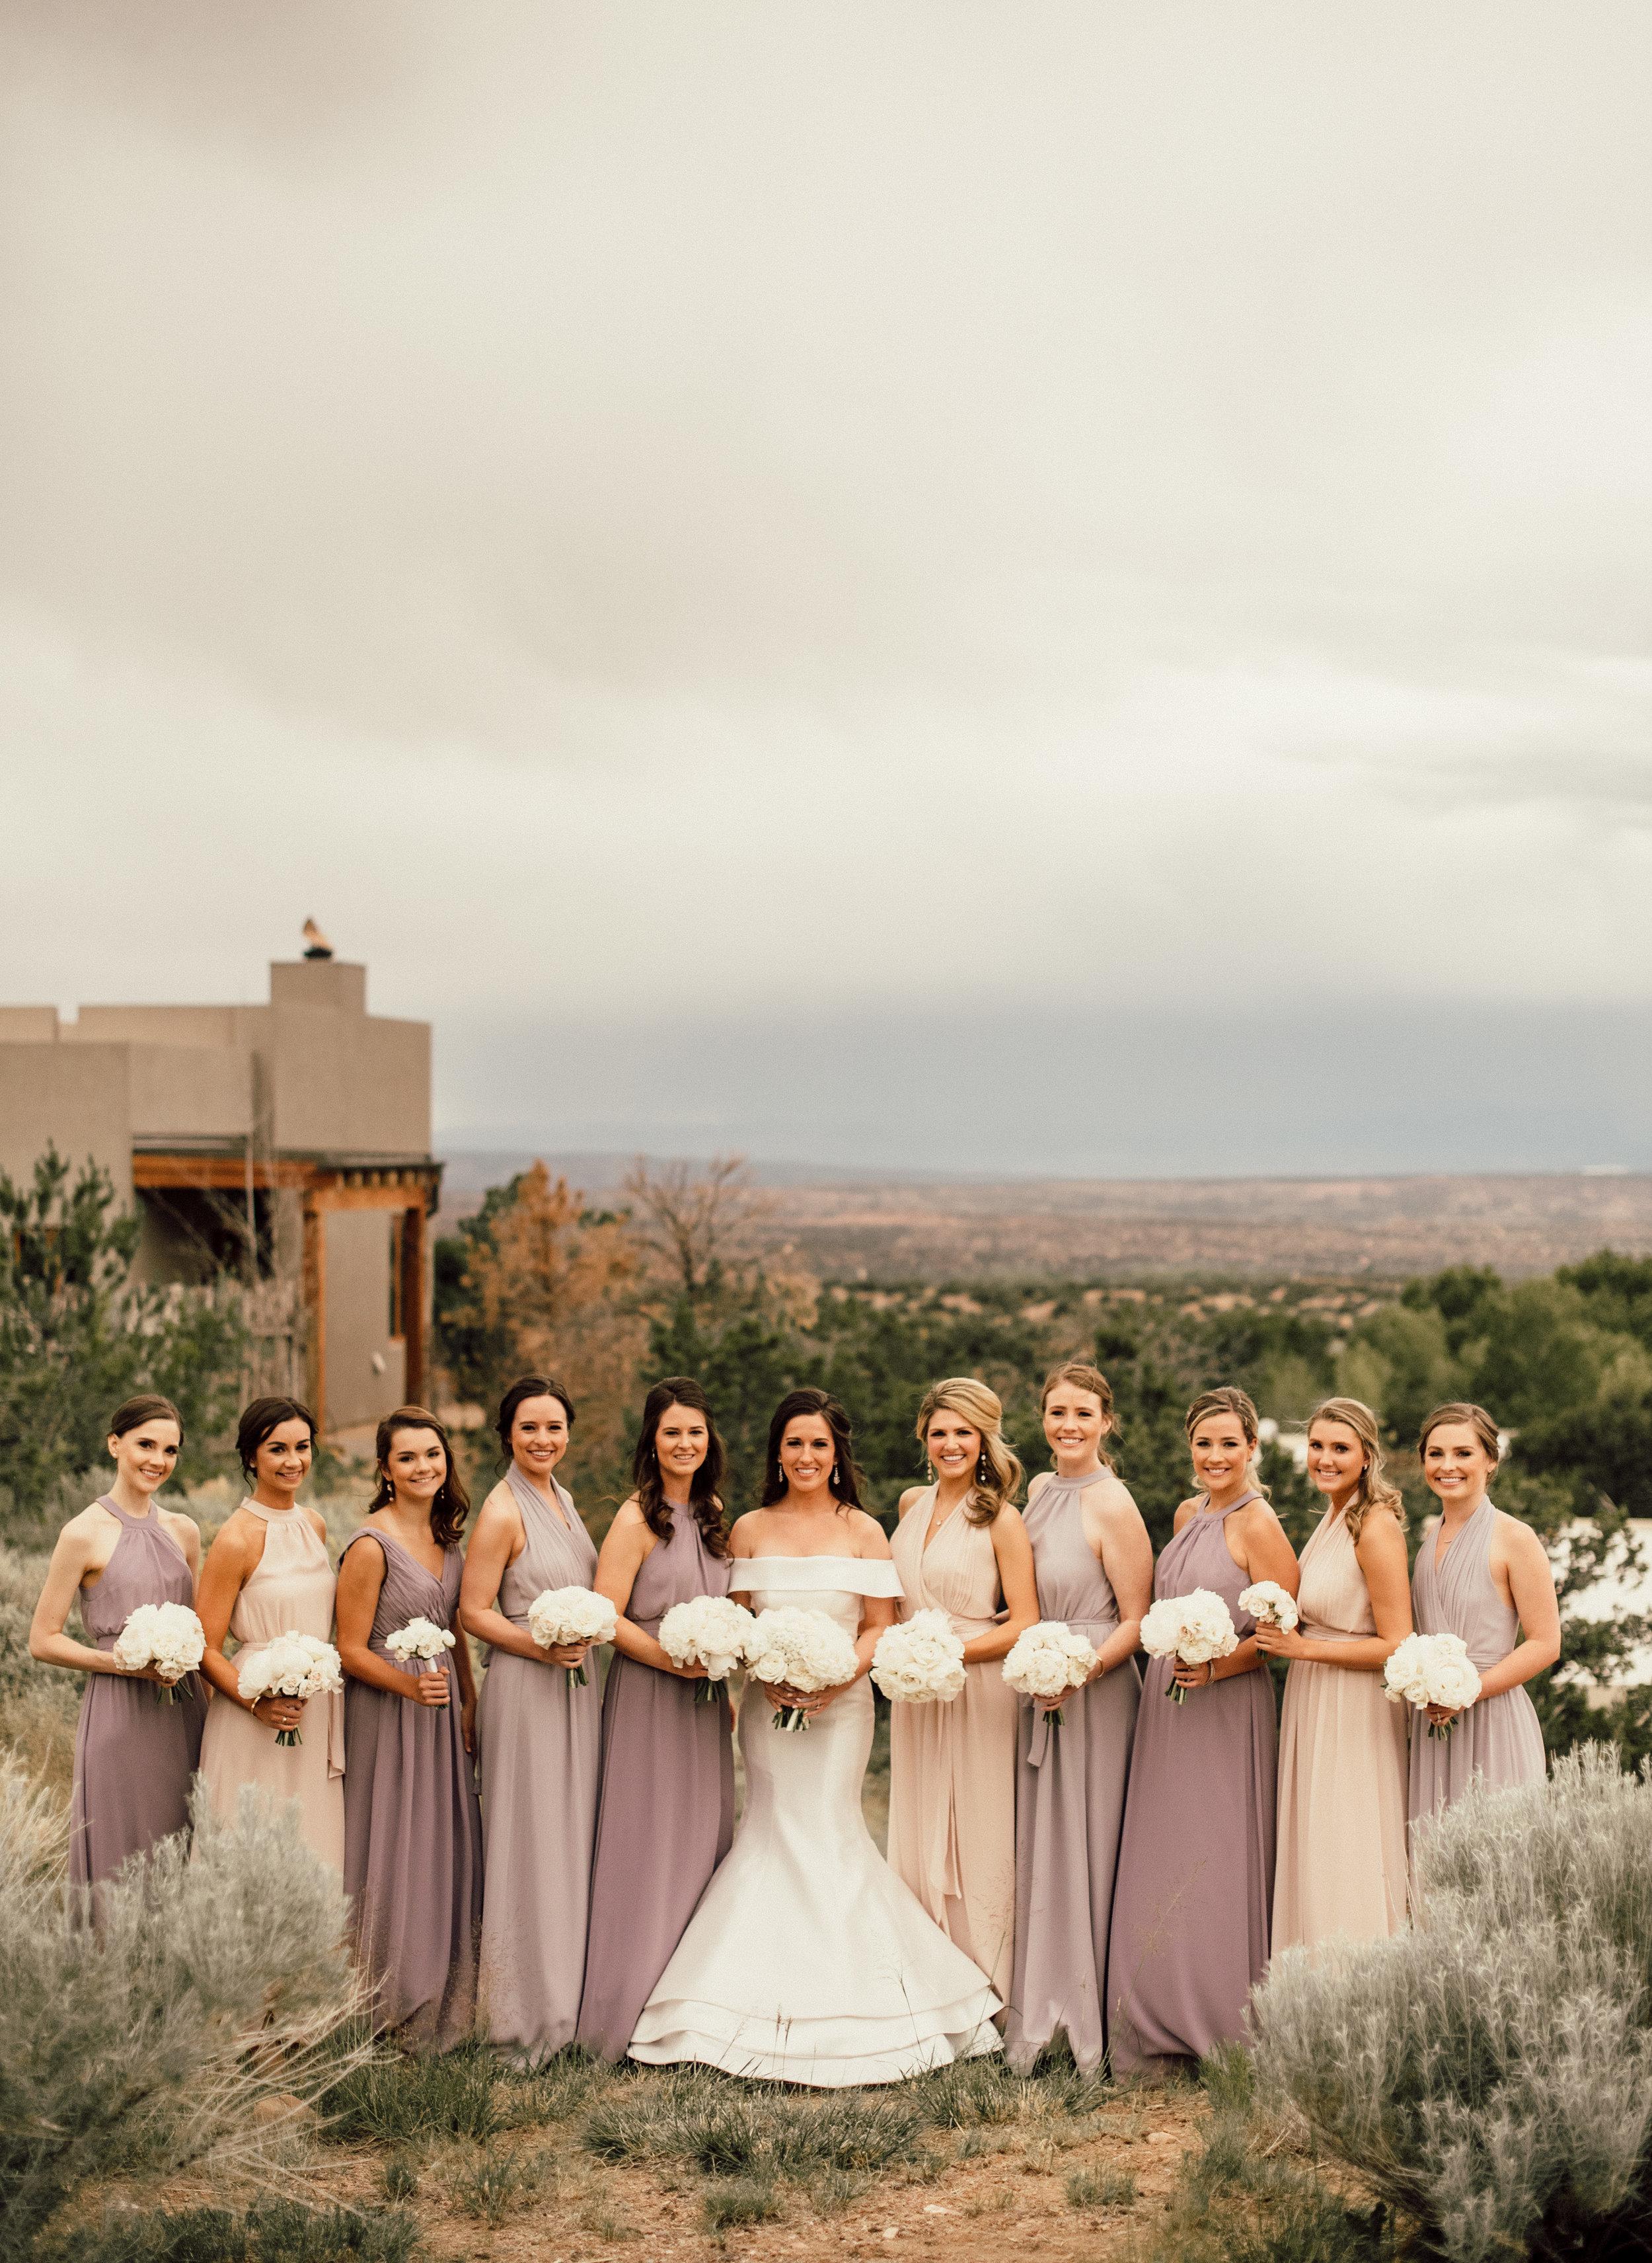 Bridesmaid Details - Santa Fe, New Mexico - Summer Wedding - Julian Leaver Events